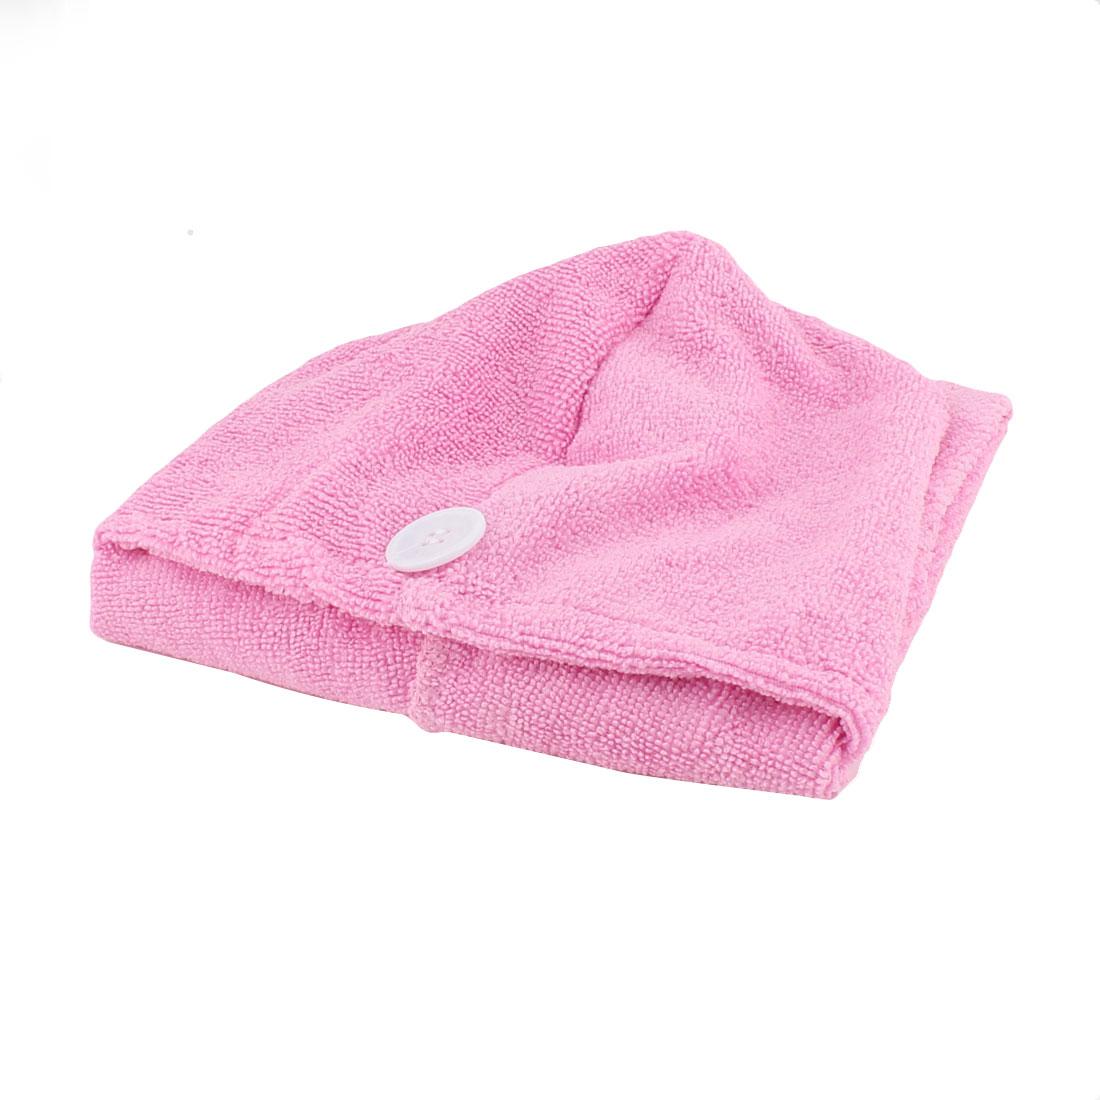 Lady Microfiber Triangle Shower Bathing Bath Hair Drying Dry Cap Hat Towel Pastel Pink